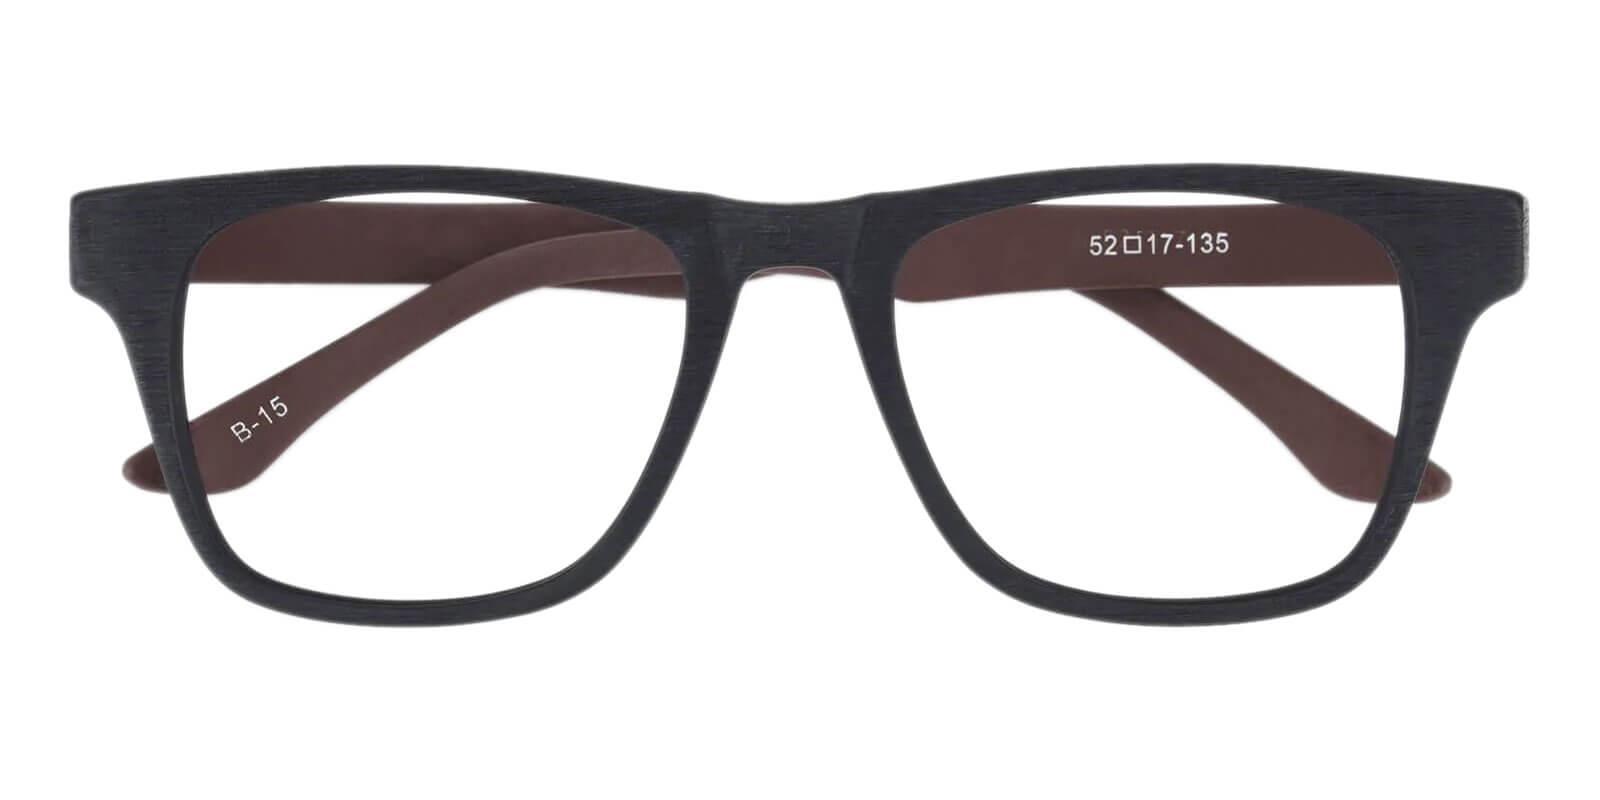 Mood Brown TR Eyeglasses , UniversalBridgeFit Frames from ABBE Glasses